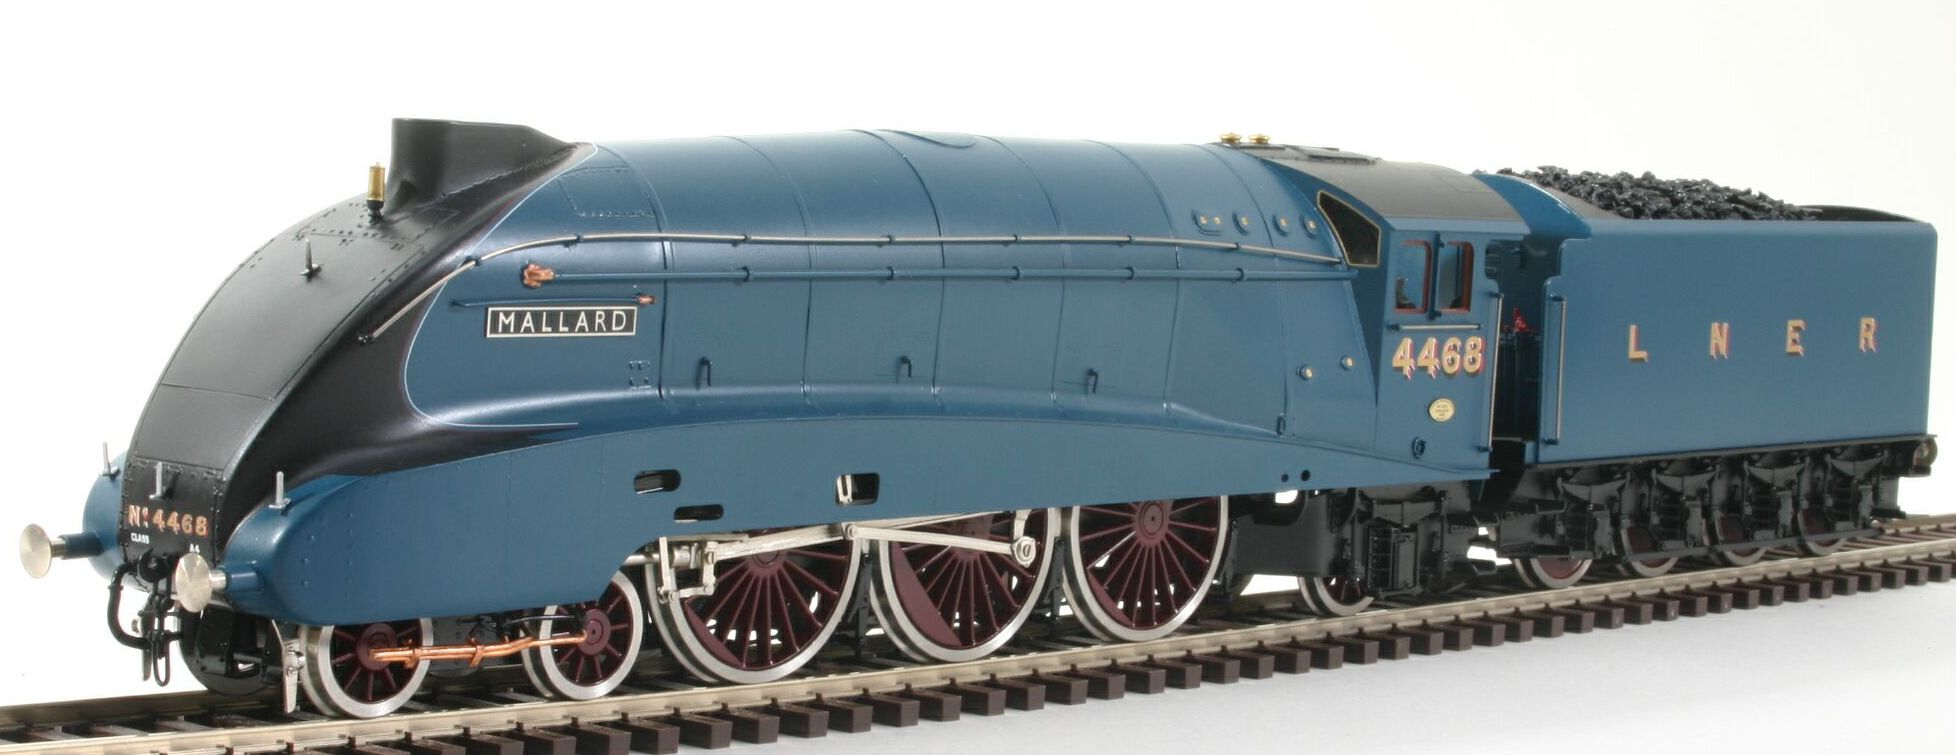 Model railway engines for sale yamaha